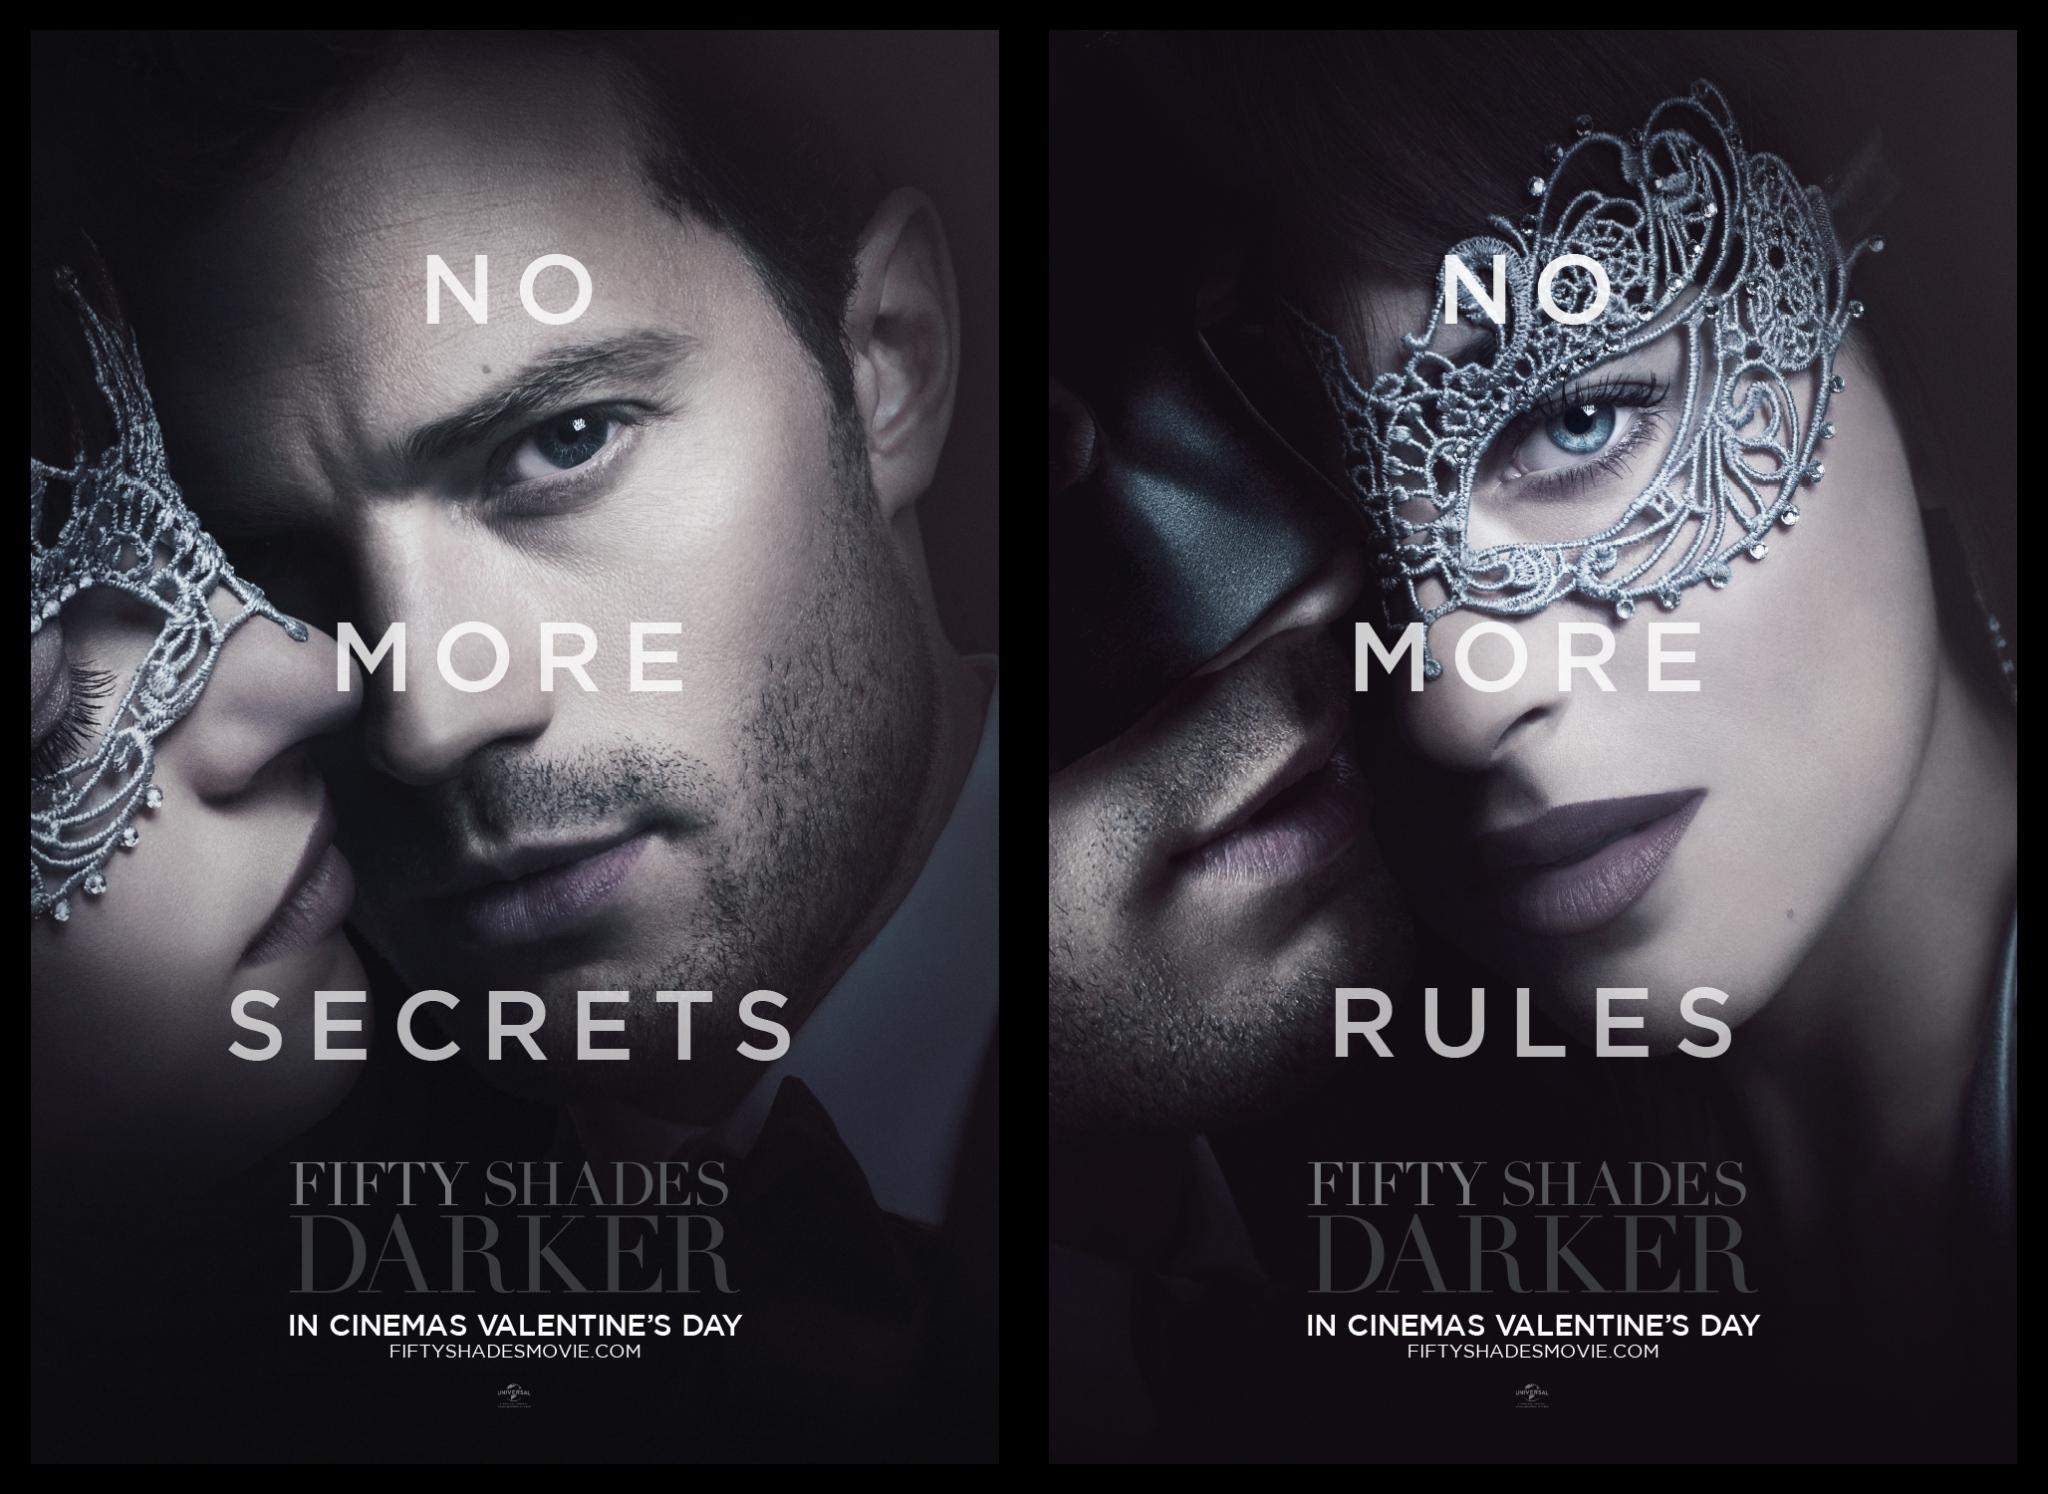 Fifty Shades Darker Review (Blu-ray) - Preutse billenkoek